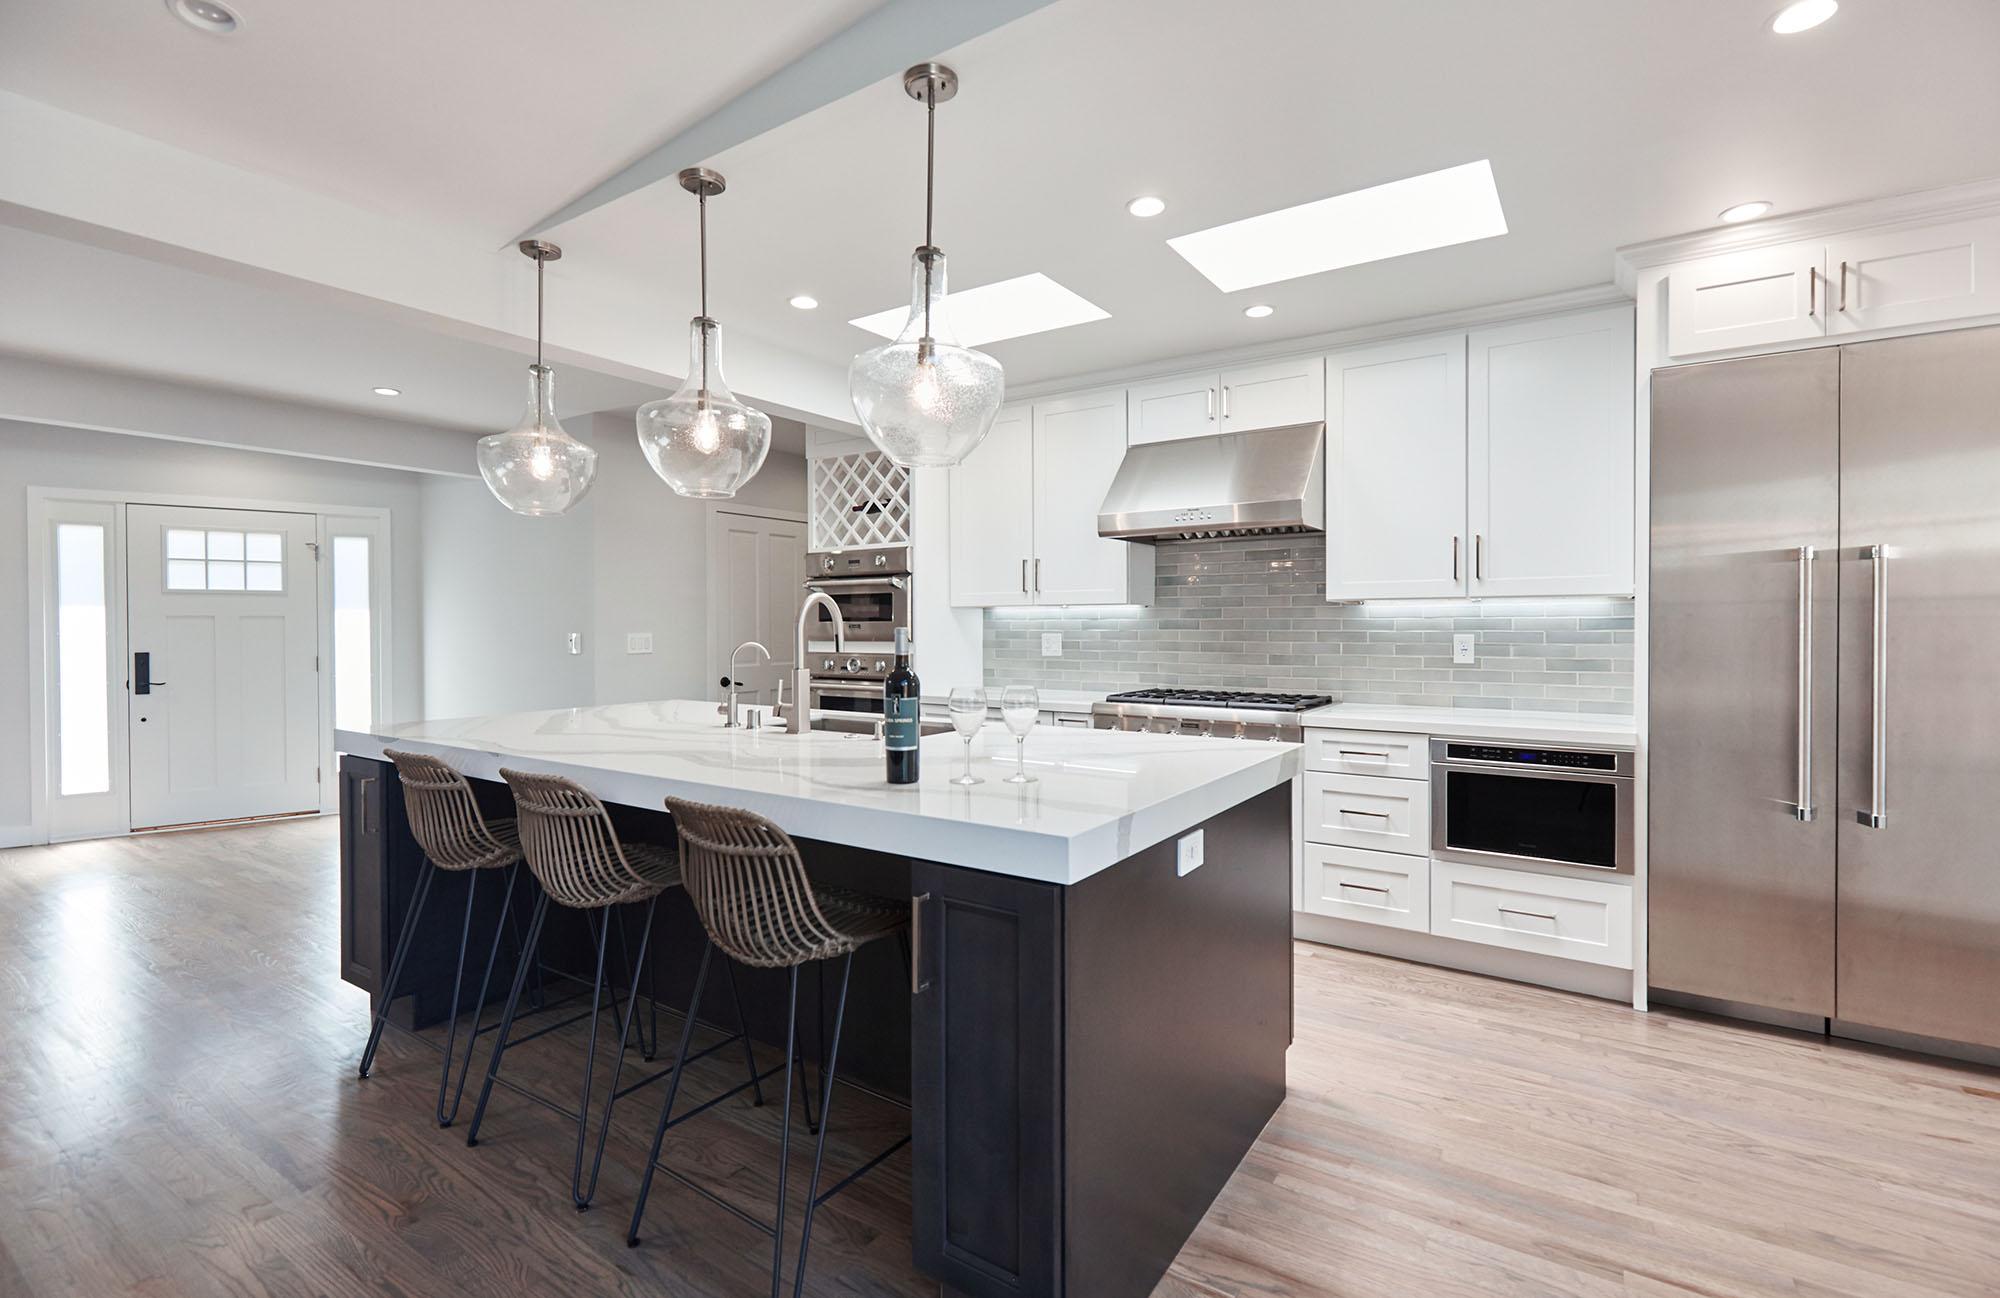 Studio city kitchen remodel 5 SMALL.jpg